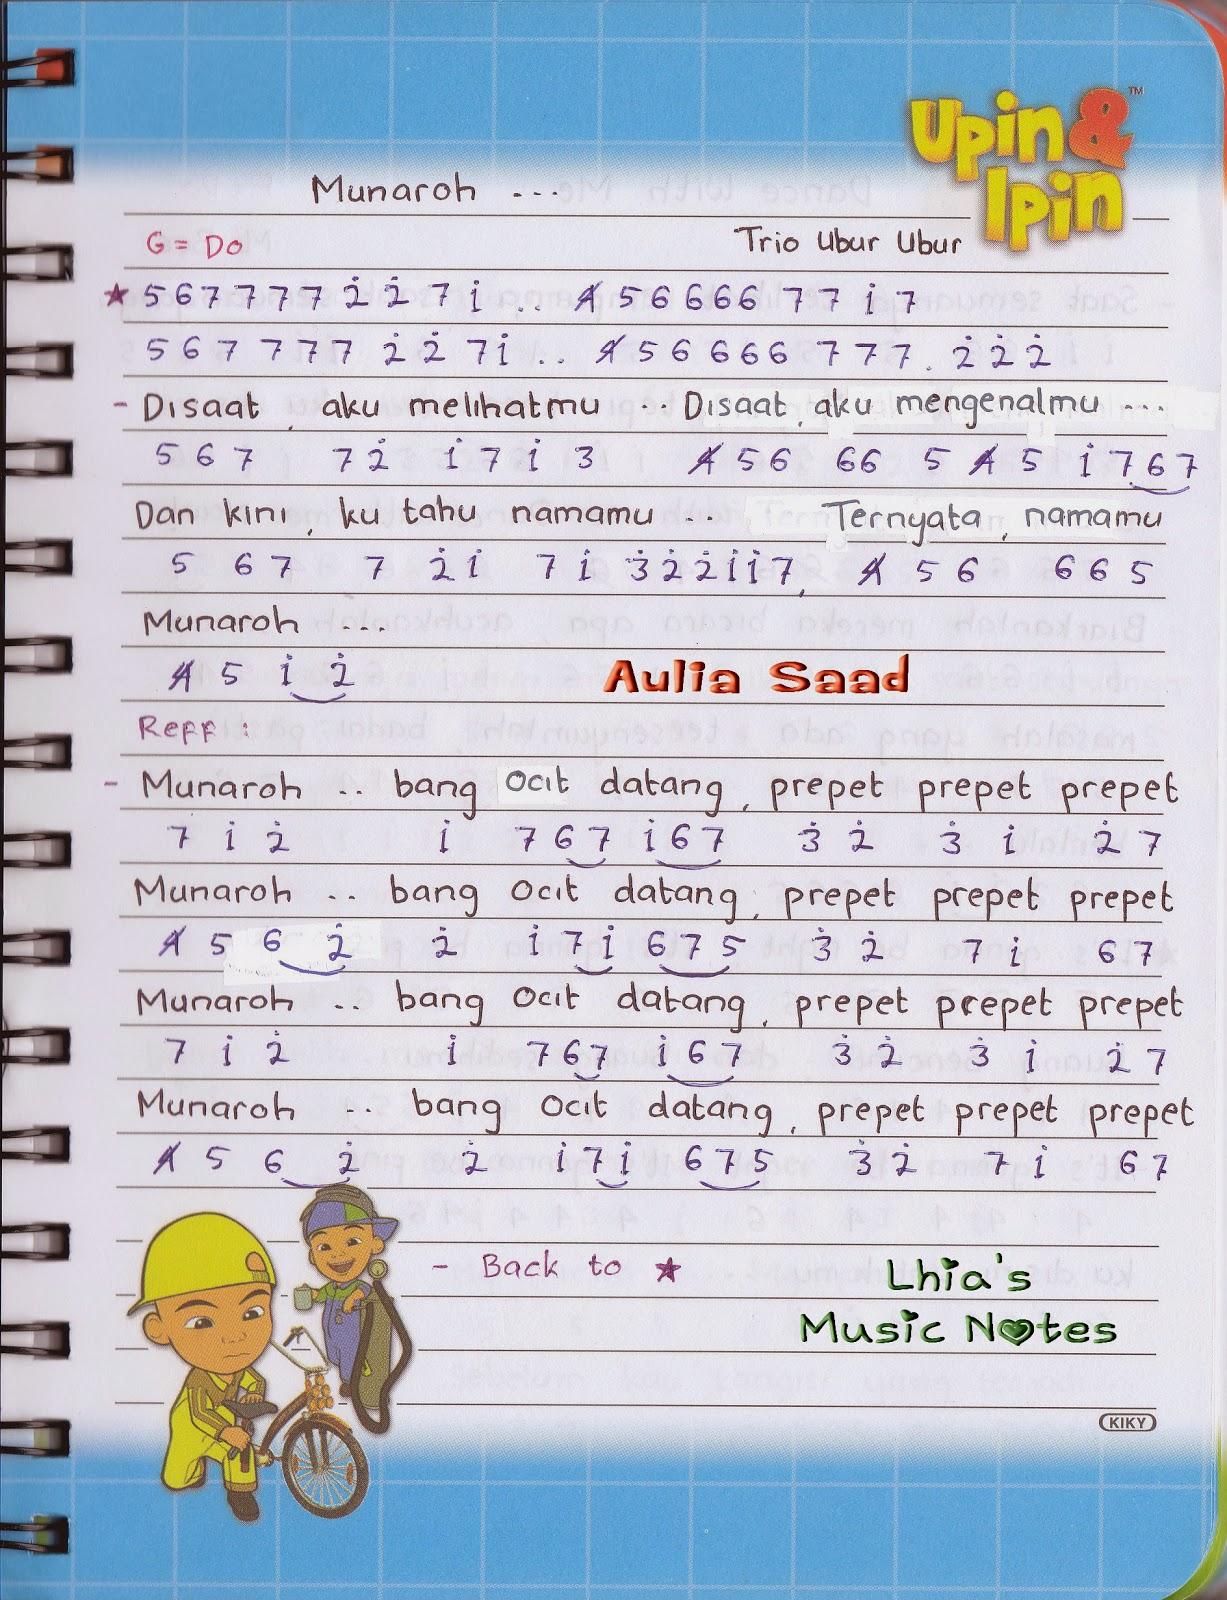 Not Angka Trio Ubur Ubur Munaroh Lhia S Music Notes